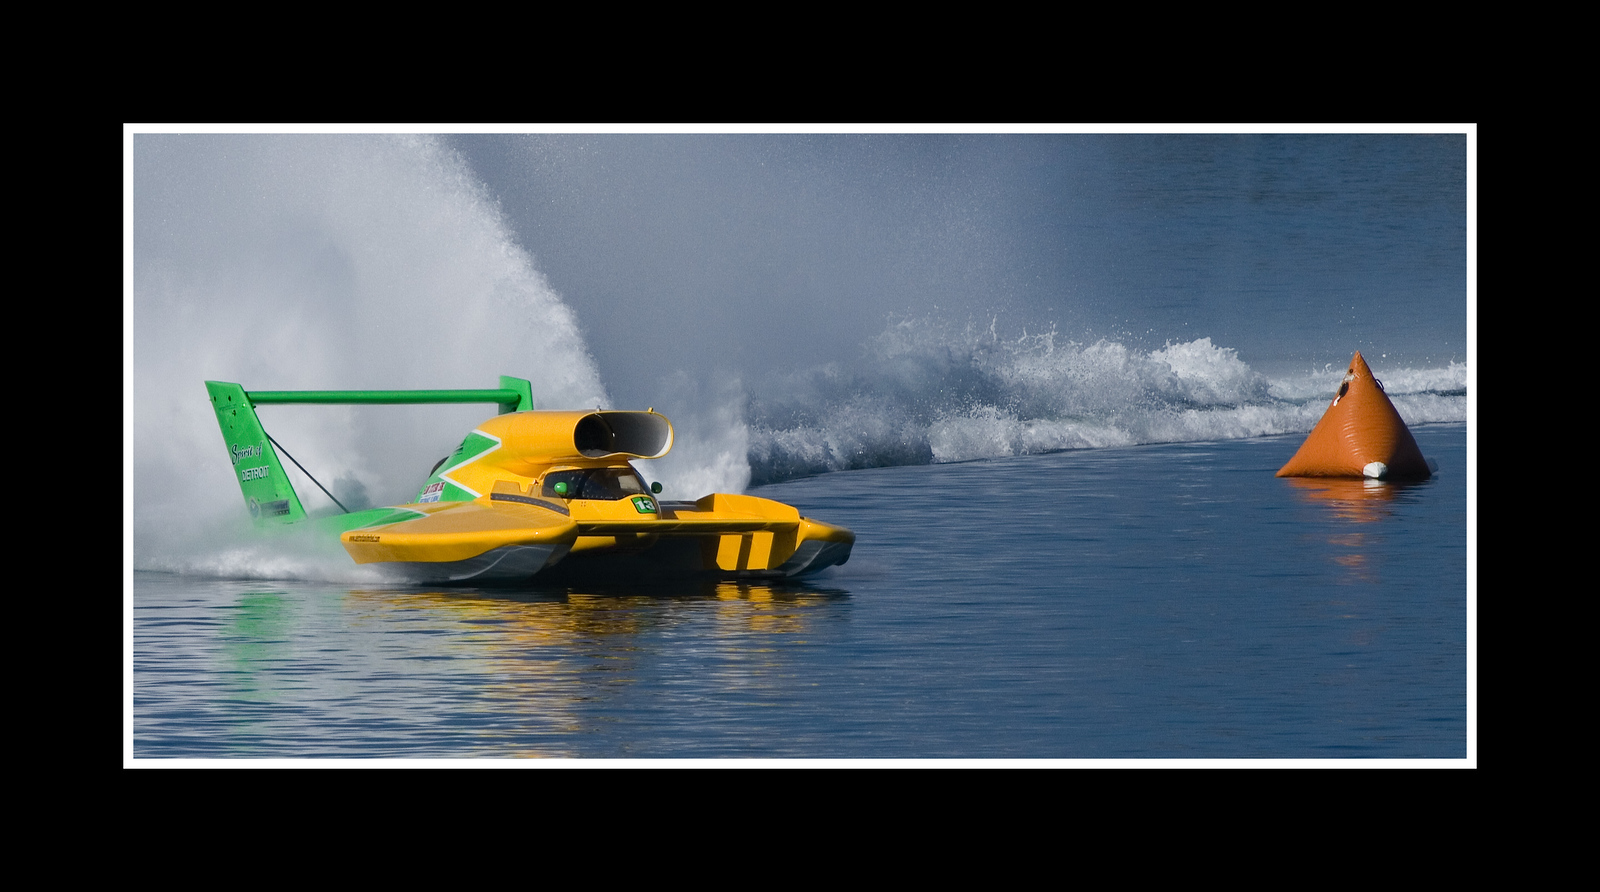 IMAGE: https://photos.smugmug.com/Sports/THUNDERBOAT-REGATTA-2007/i-d9NQJKf/0/1a6f0a67/X3/JPEG%20Thunderboat%200378-X3.jpg